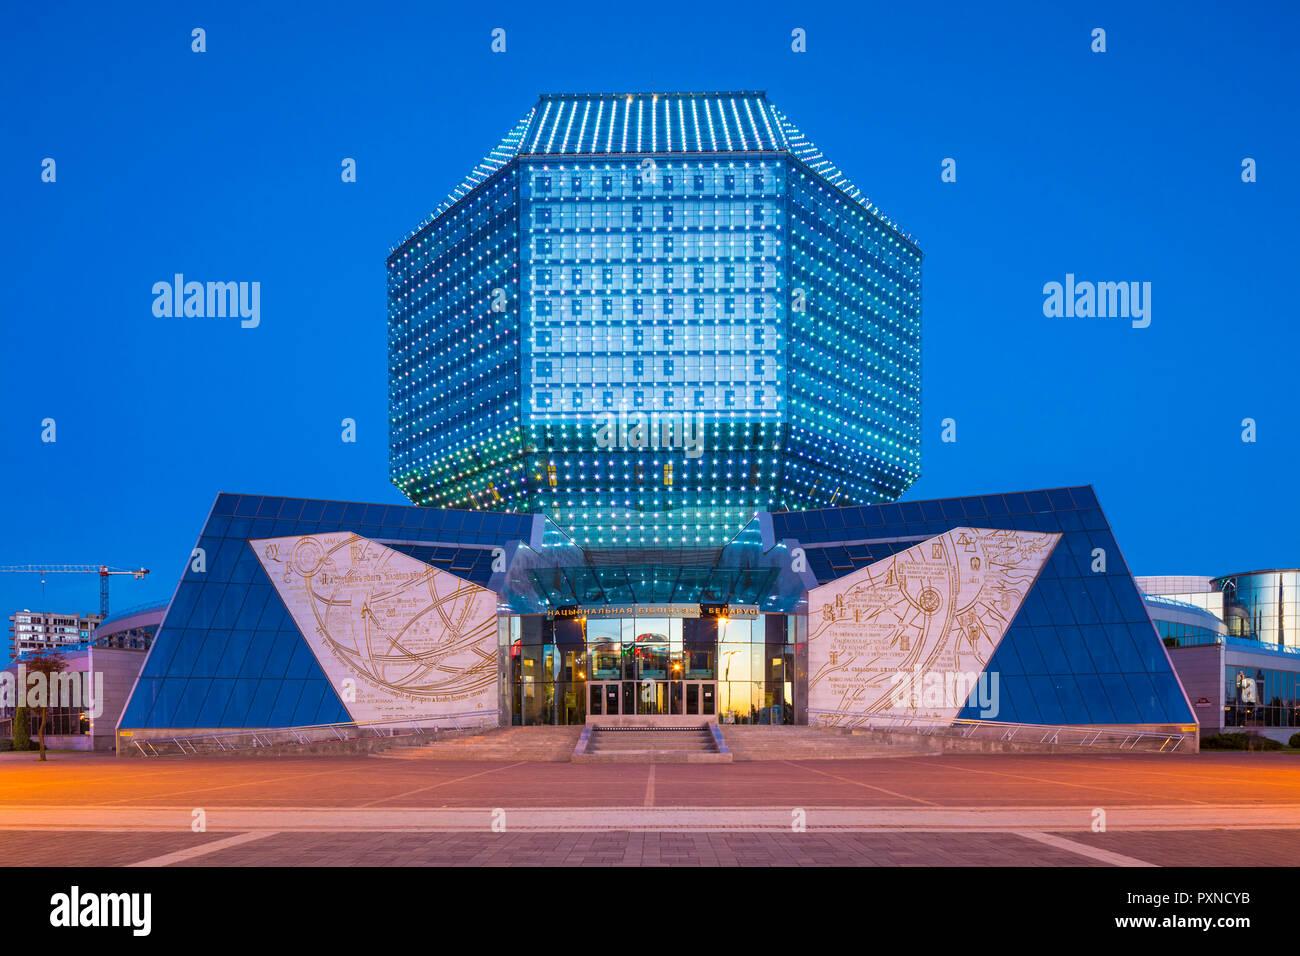 National Library of Belarus, Minsk, Belarus - Stock Image